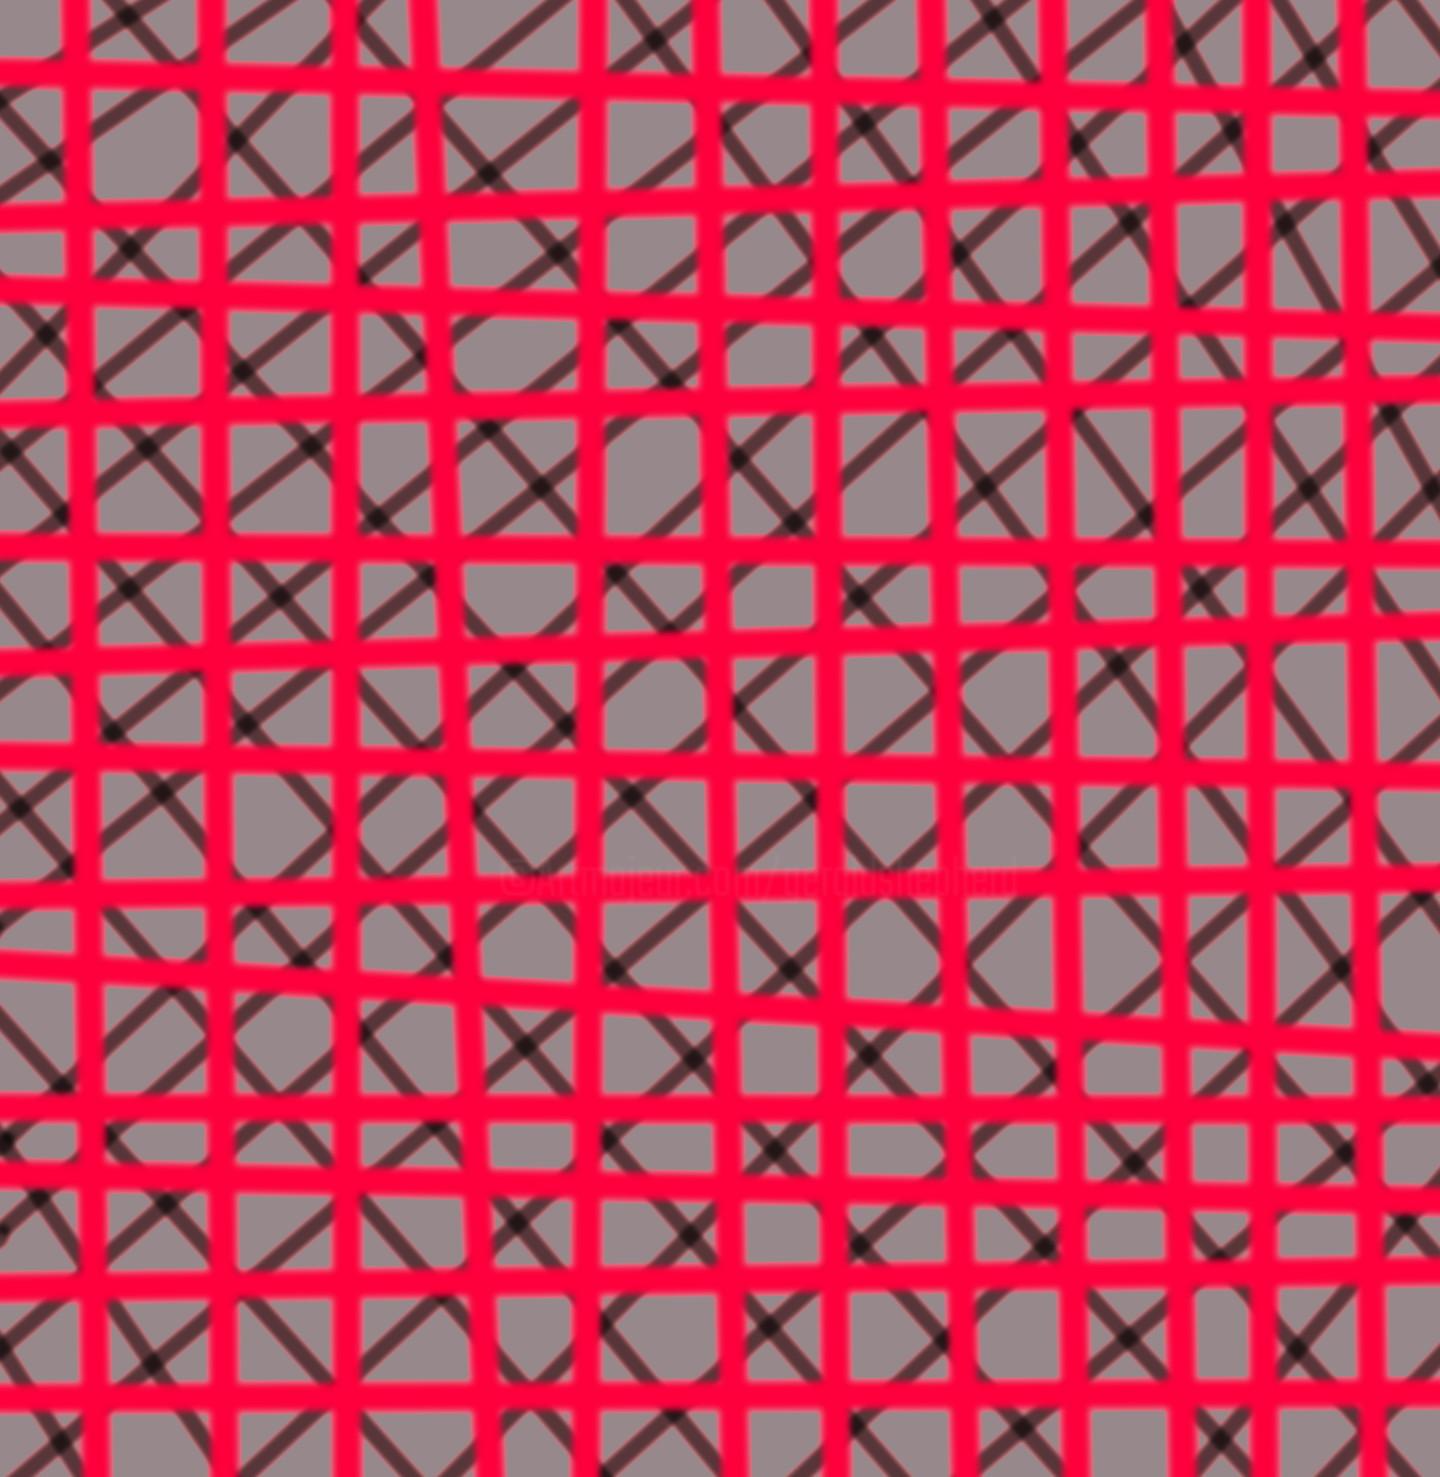 Gerald Shepherd - Red Grid